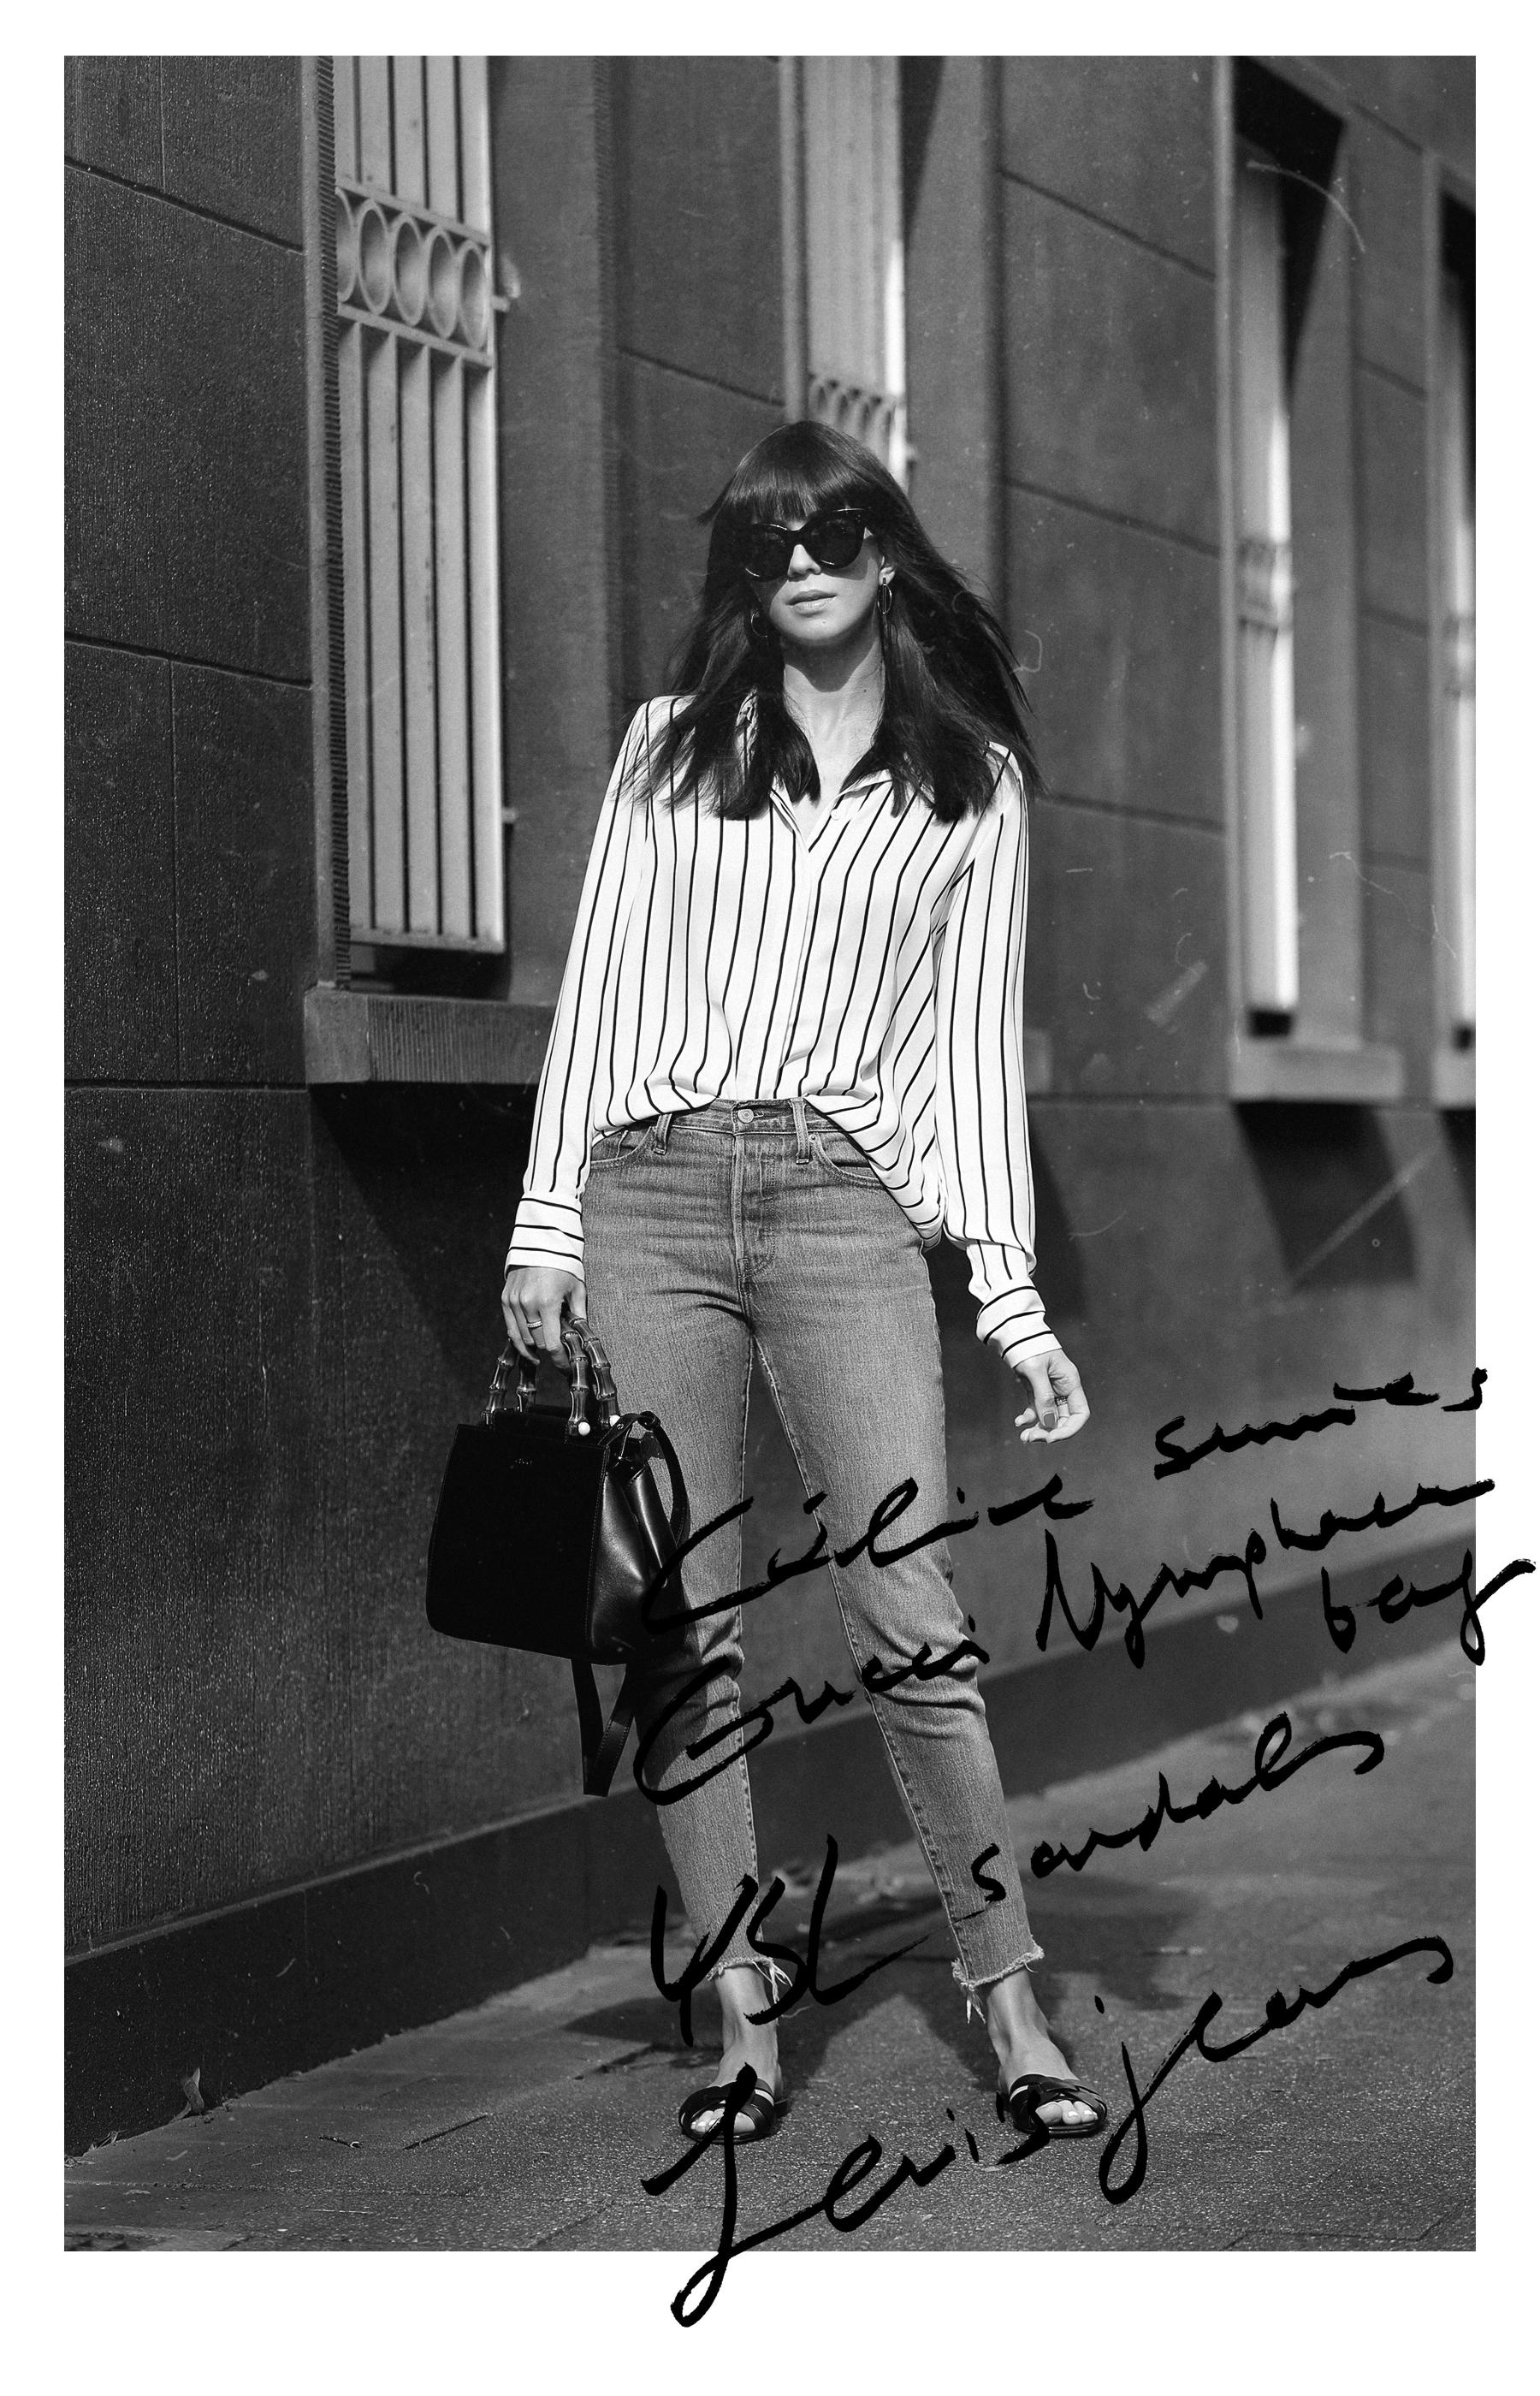 stripe blouse gucci nymphaea bag bamboo ysl saint laurent sandals slipper levi's jeans céline audrey sunglasses spring outfit minimal parisienne chic brunette bangs madame ricarda schernus cats&dogs blog modeblogger ootd outfitblogger düsseldorf 6